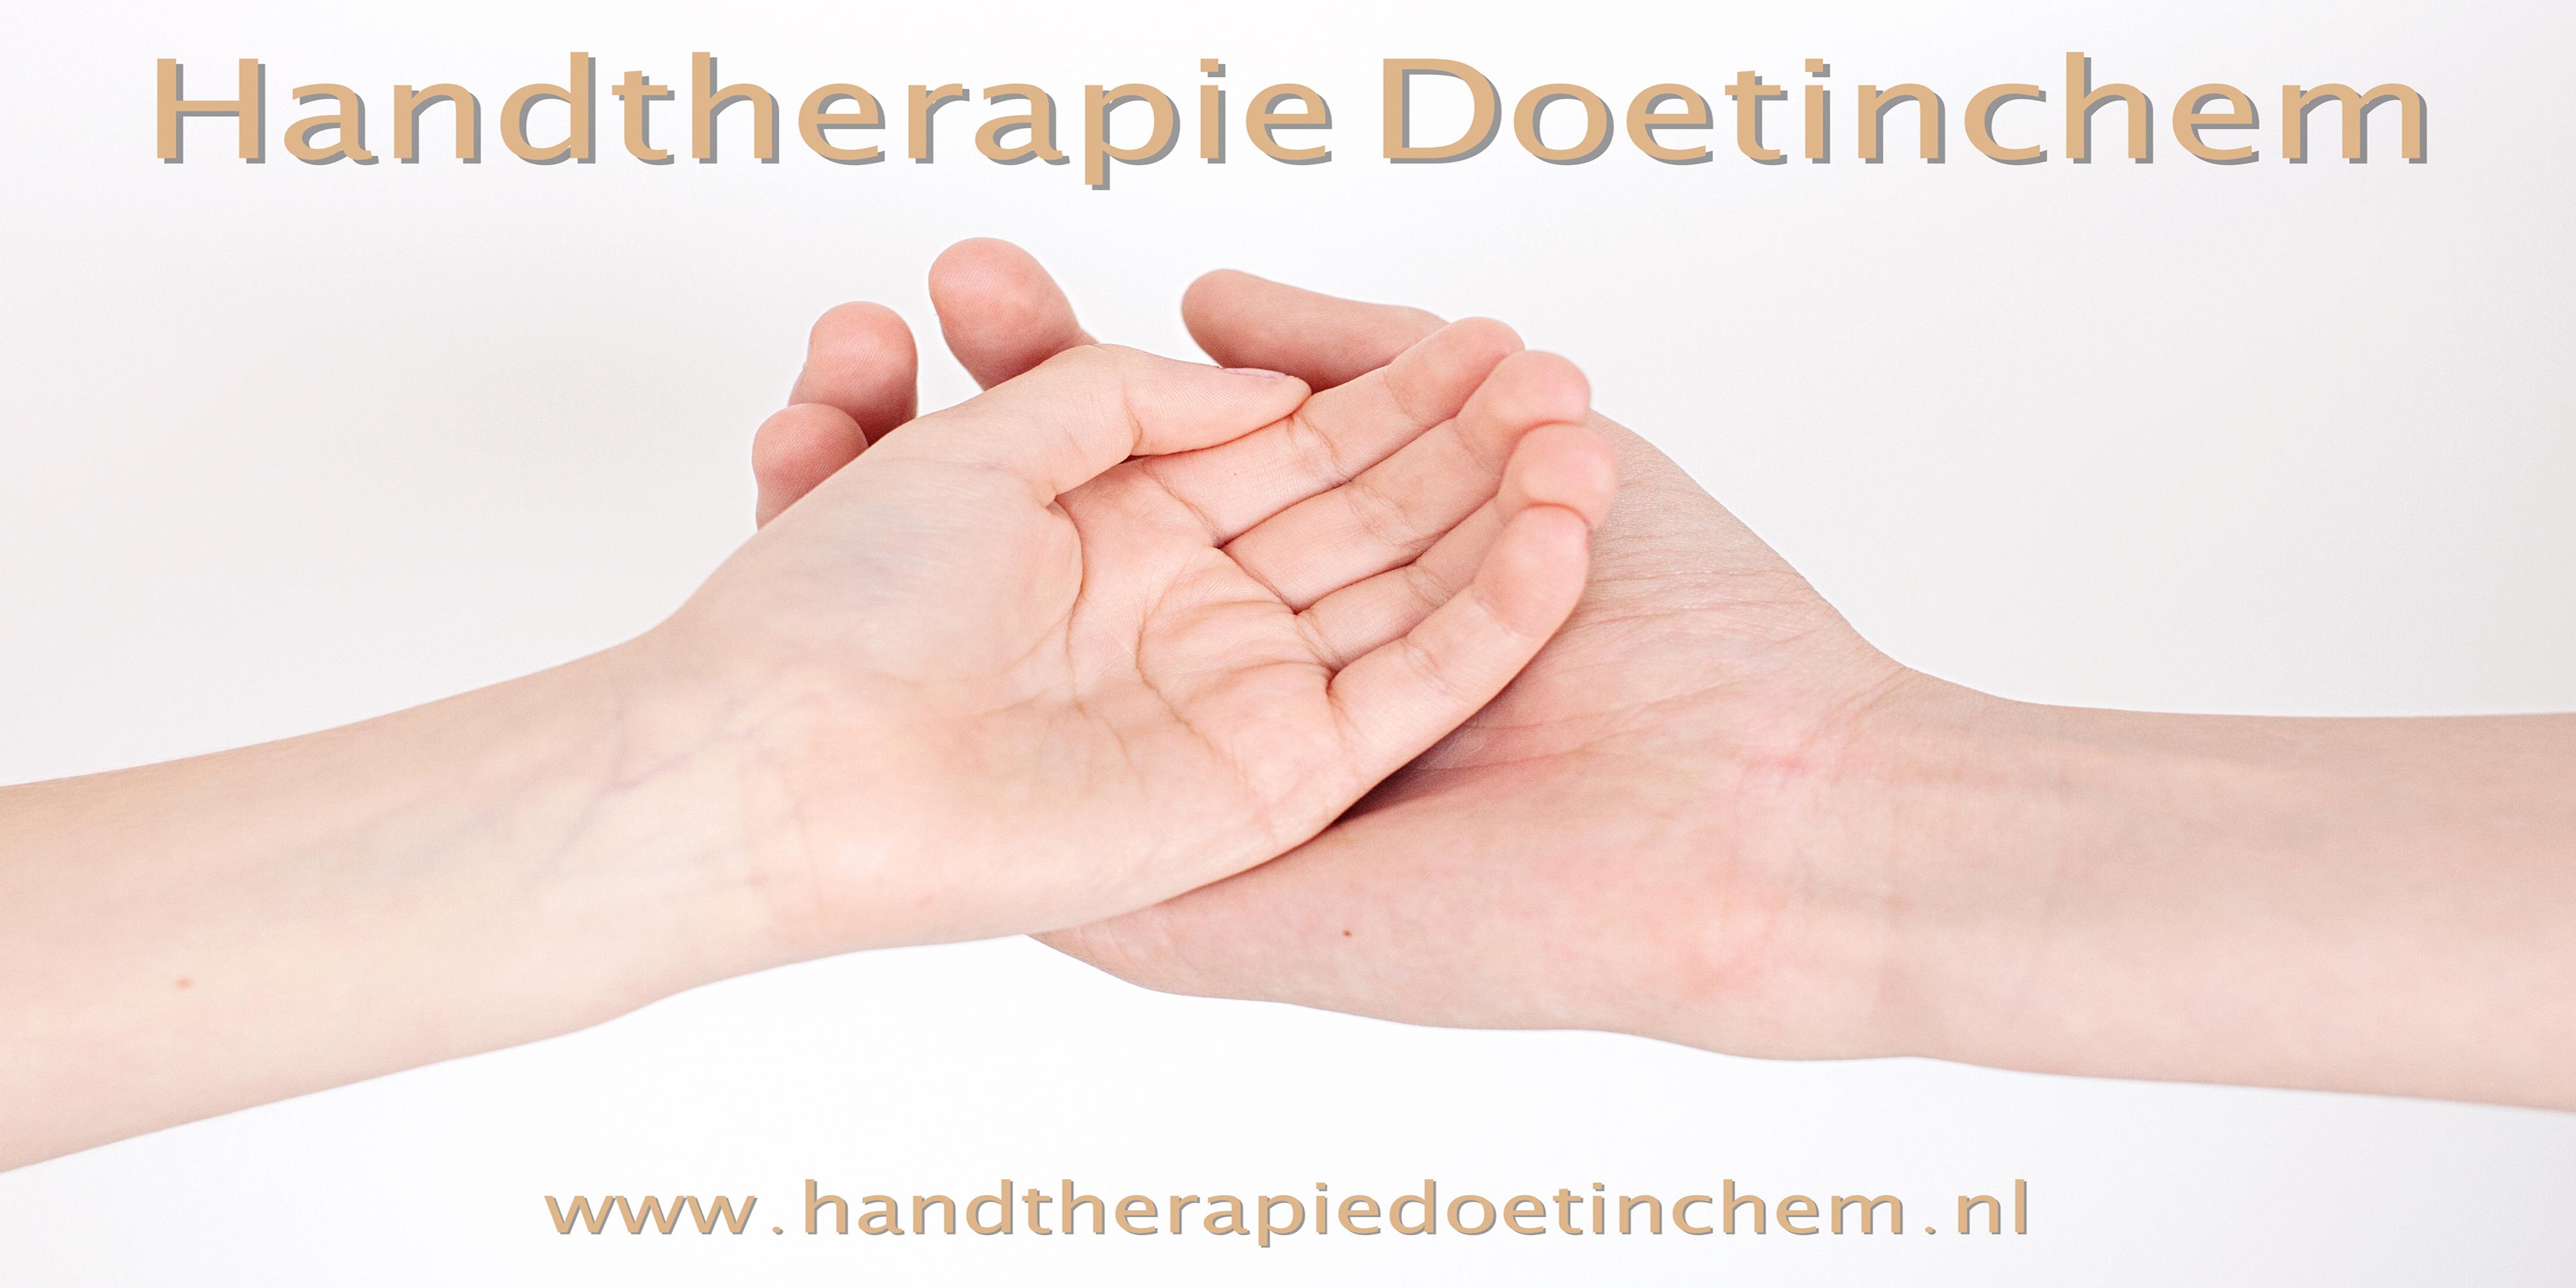 Handtherapie Doetinchem